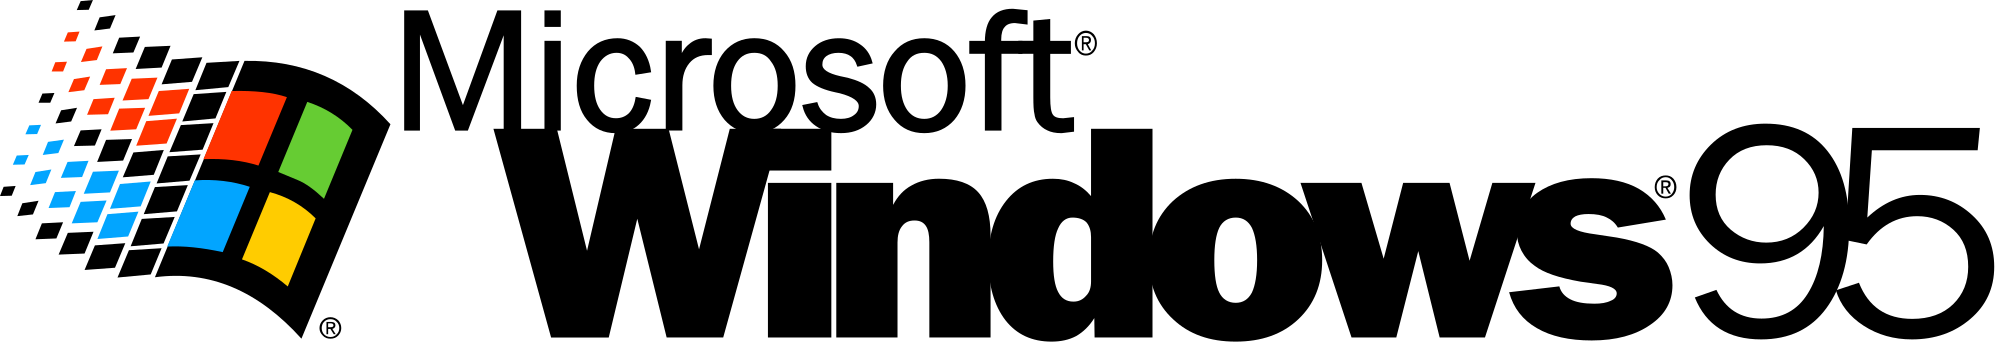 Windows 95 logo png. File svg wikimedia commons